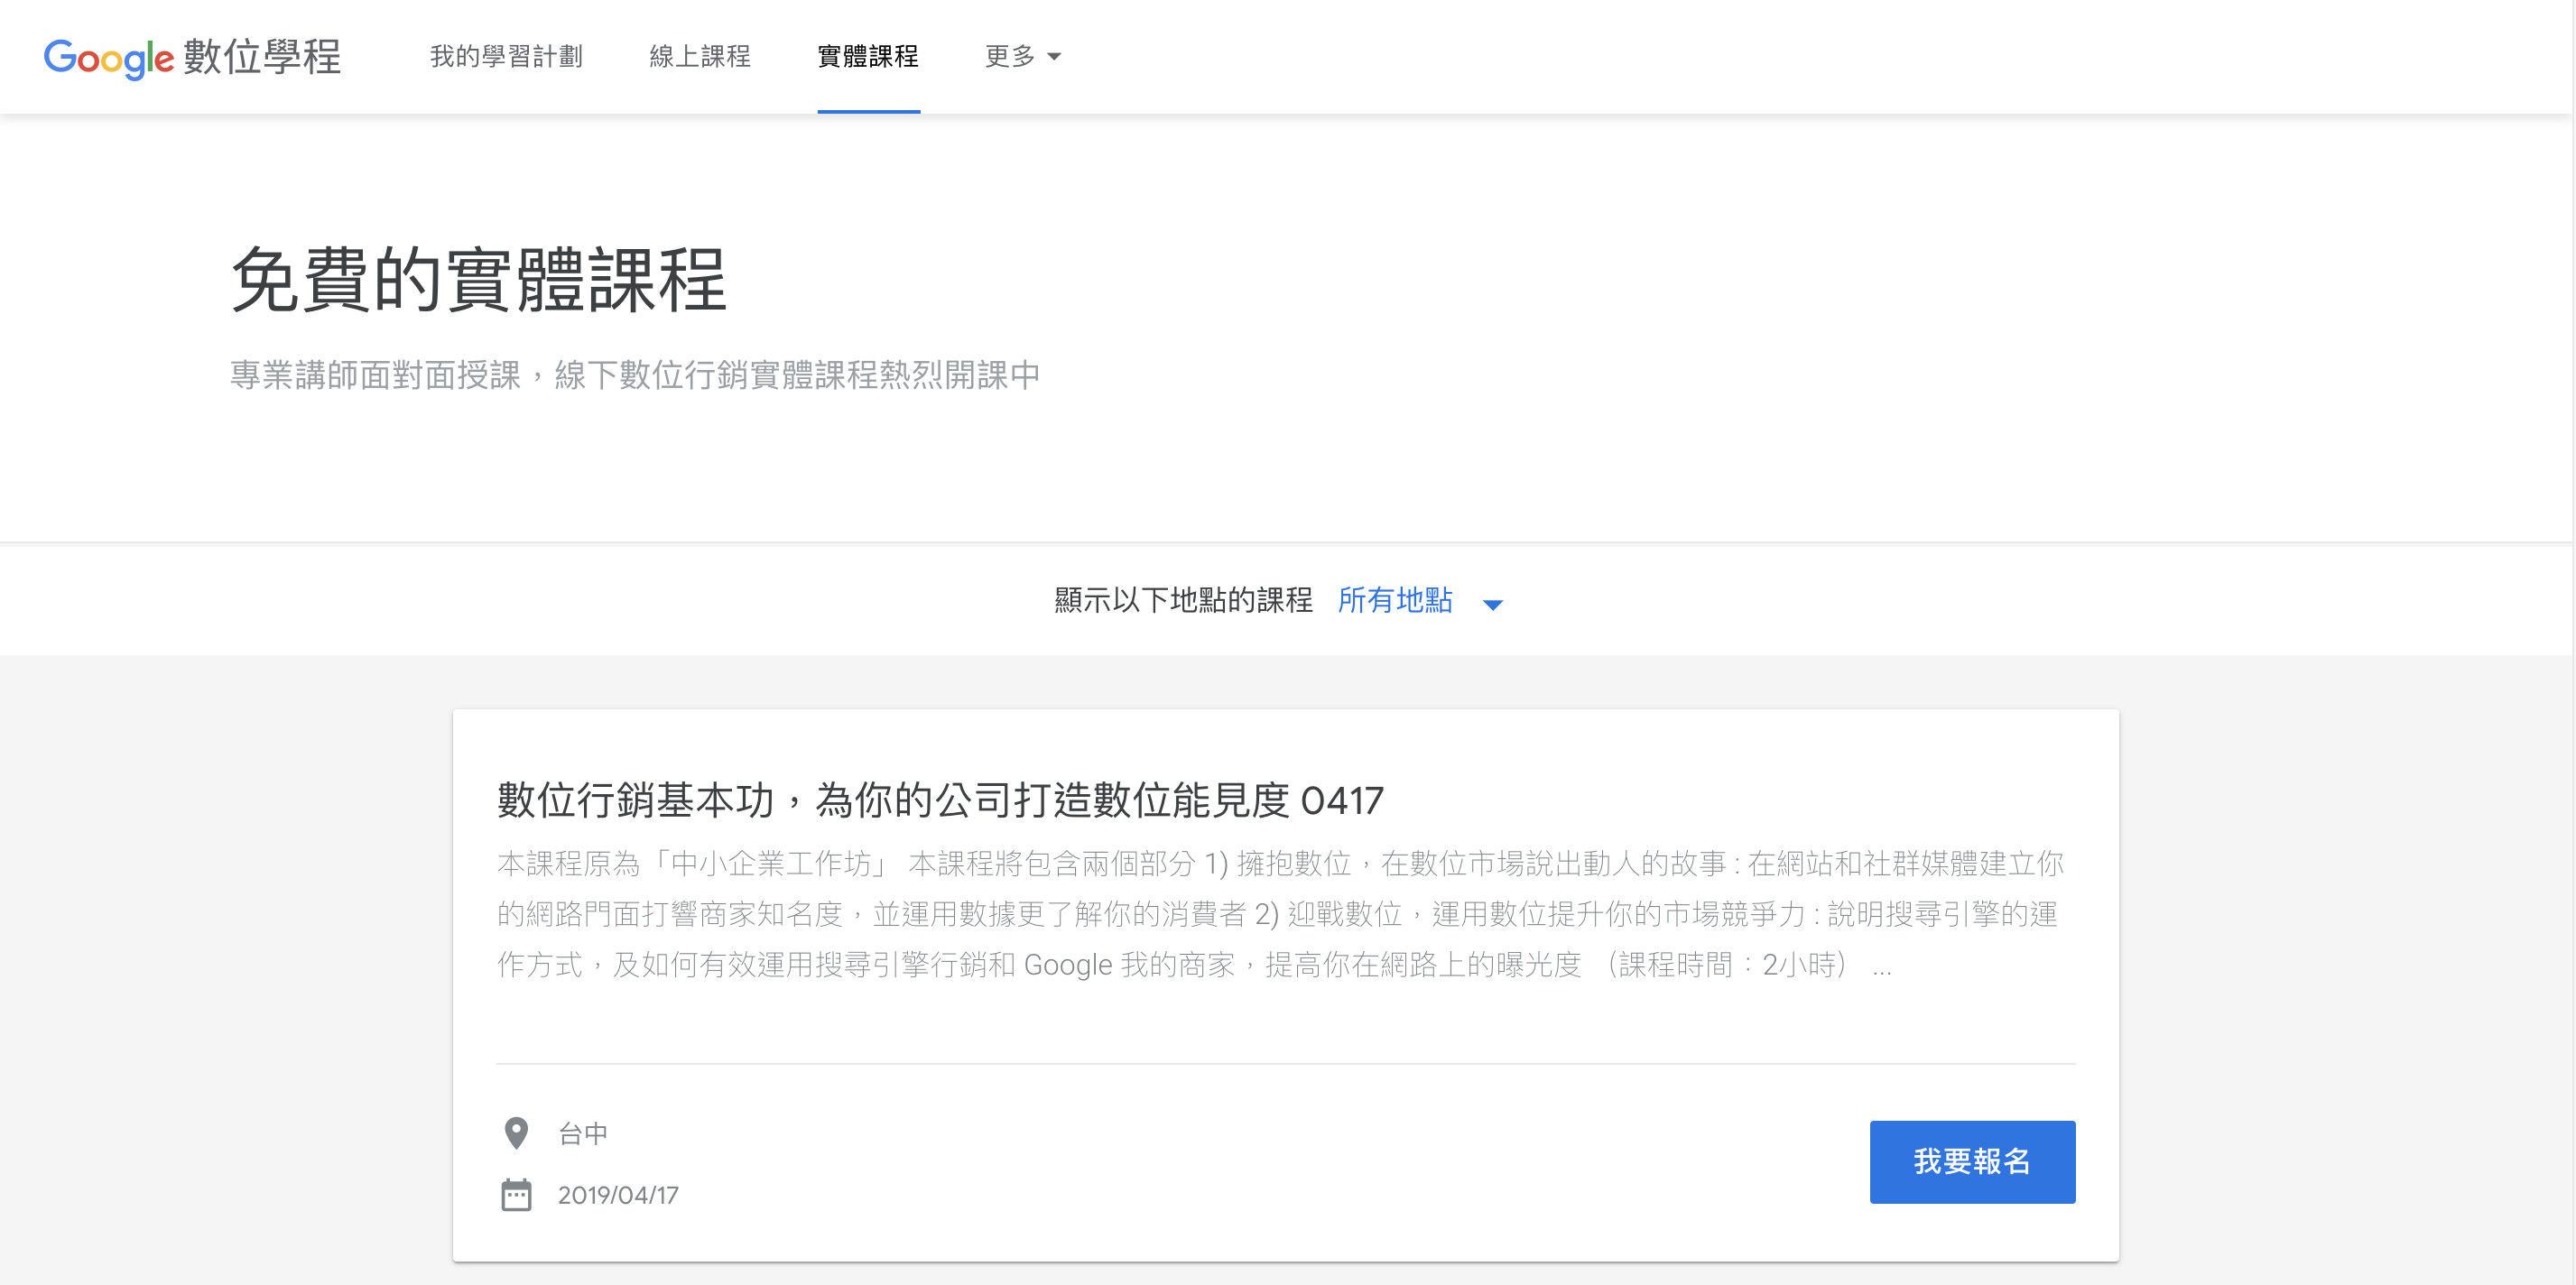 Google數位學程認證智慧台灣計畫實體課程-鯊客科技SEO網頁設計公司